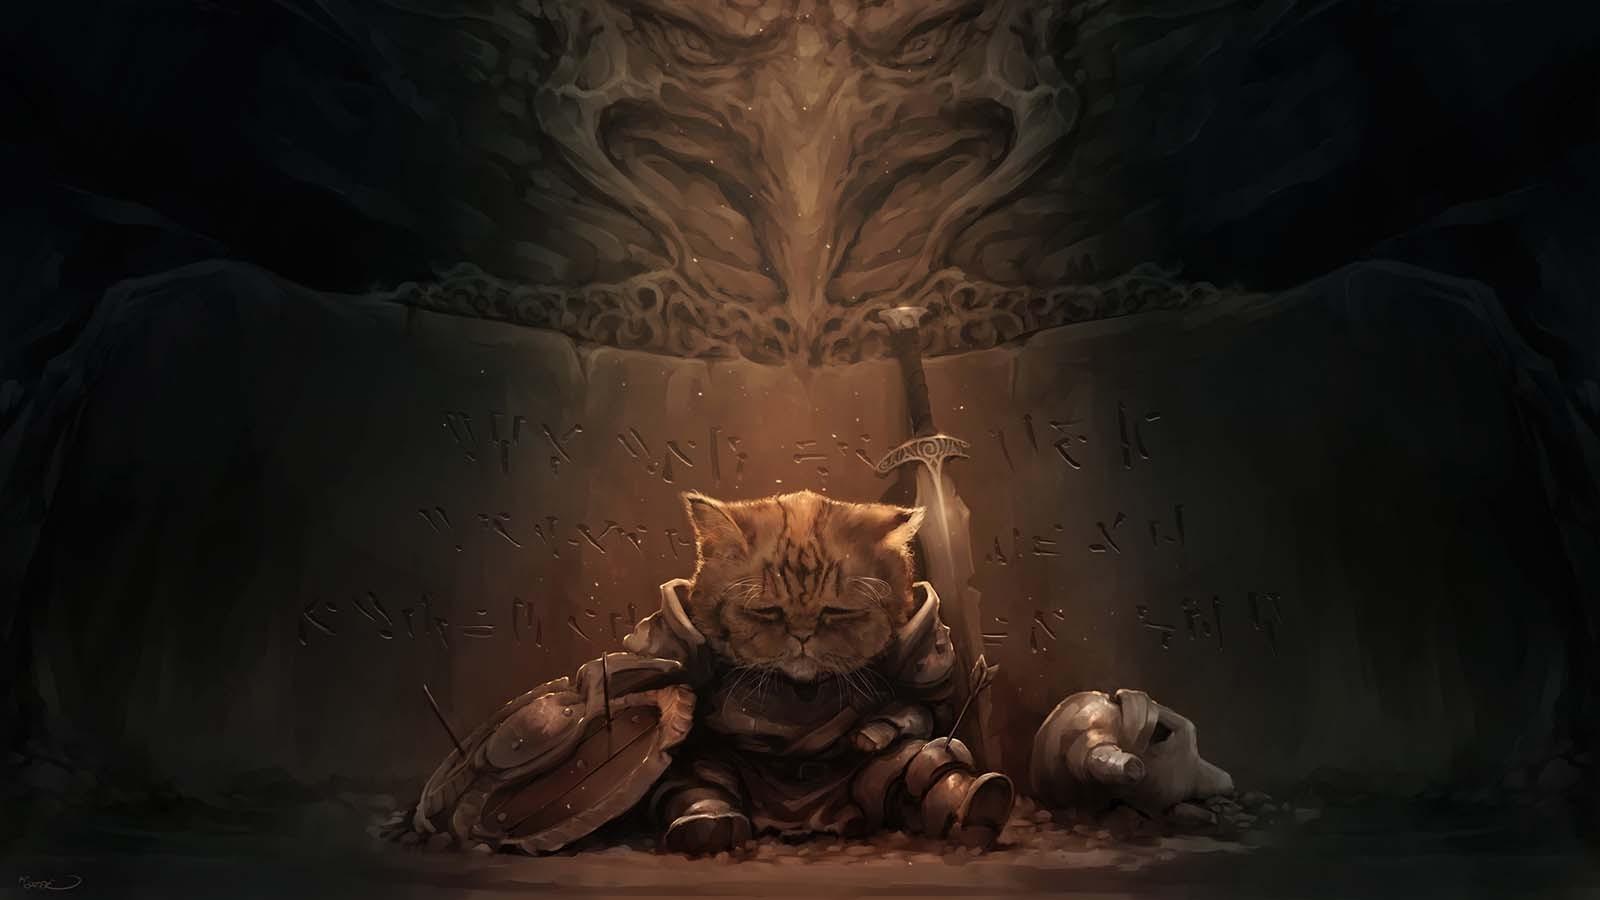 Cute Bloodborne Wallpaper The Elder Scrolls V Skyrim Wallpapers Hd Desktop And